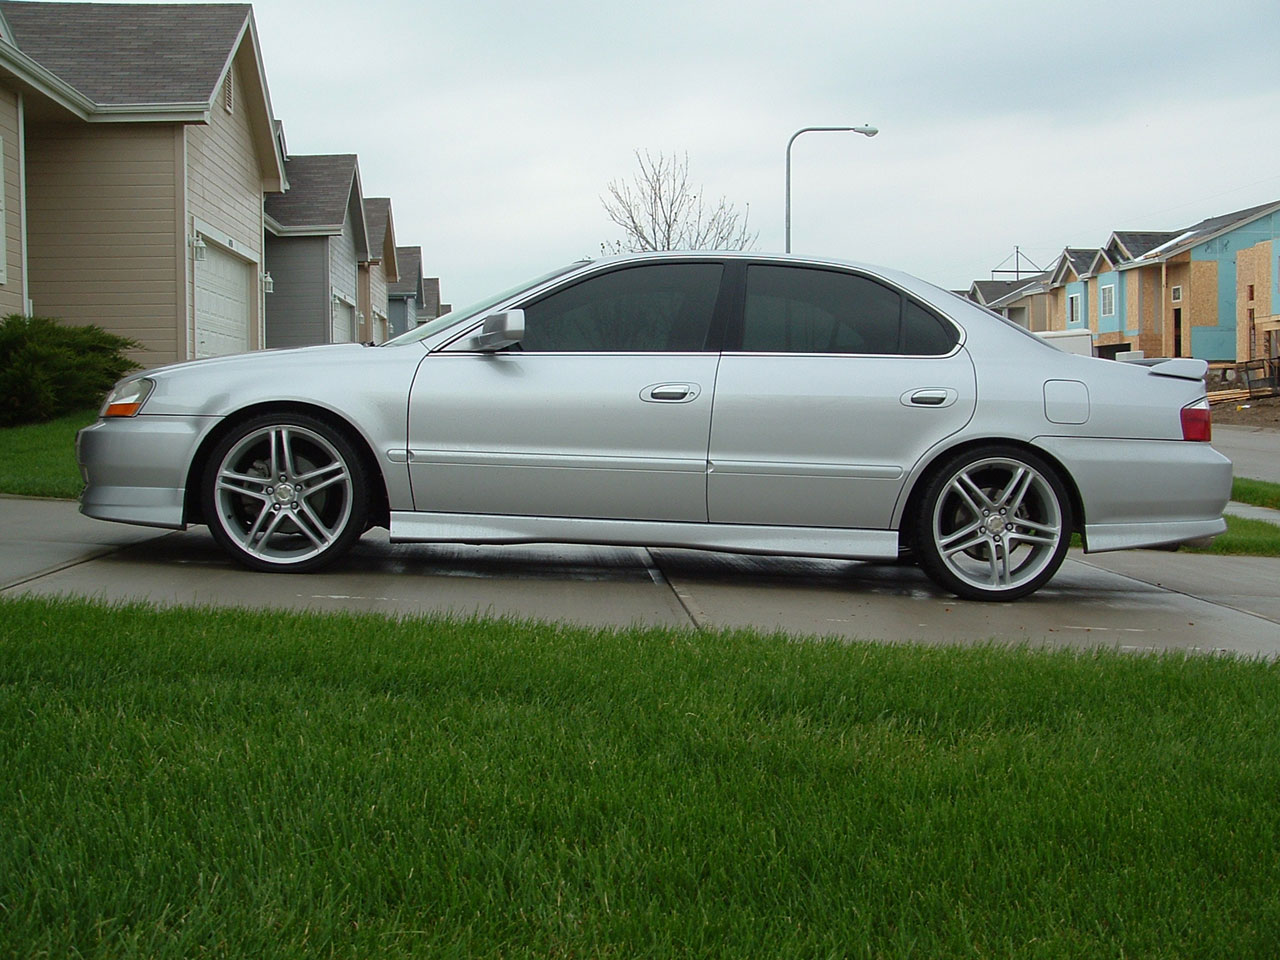 FS: 2003 SSM Acura TL-S (Comptech, 19 inch wheels, + more) - Omaha, NE - AcuraZine - Acura ...